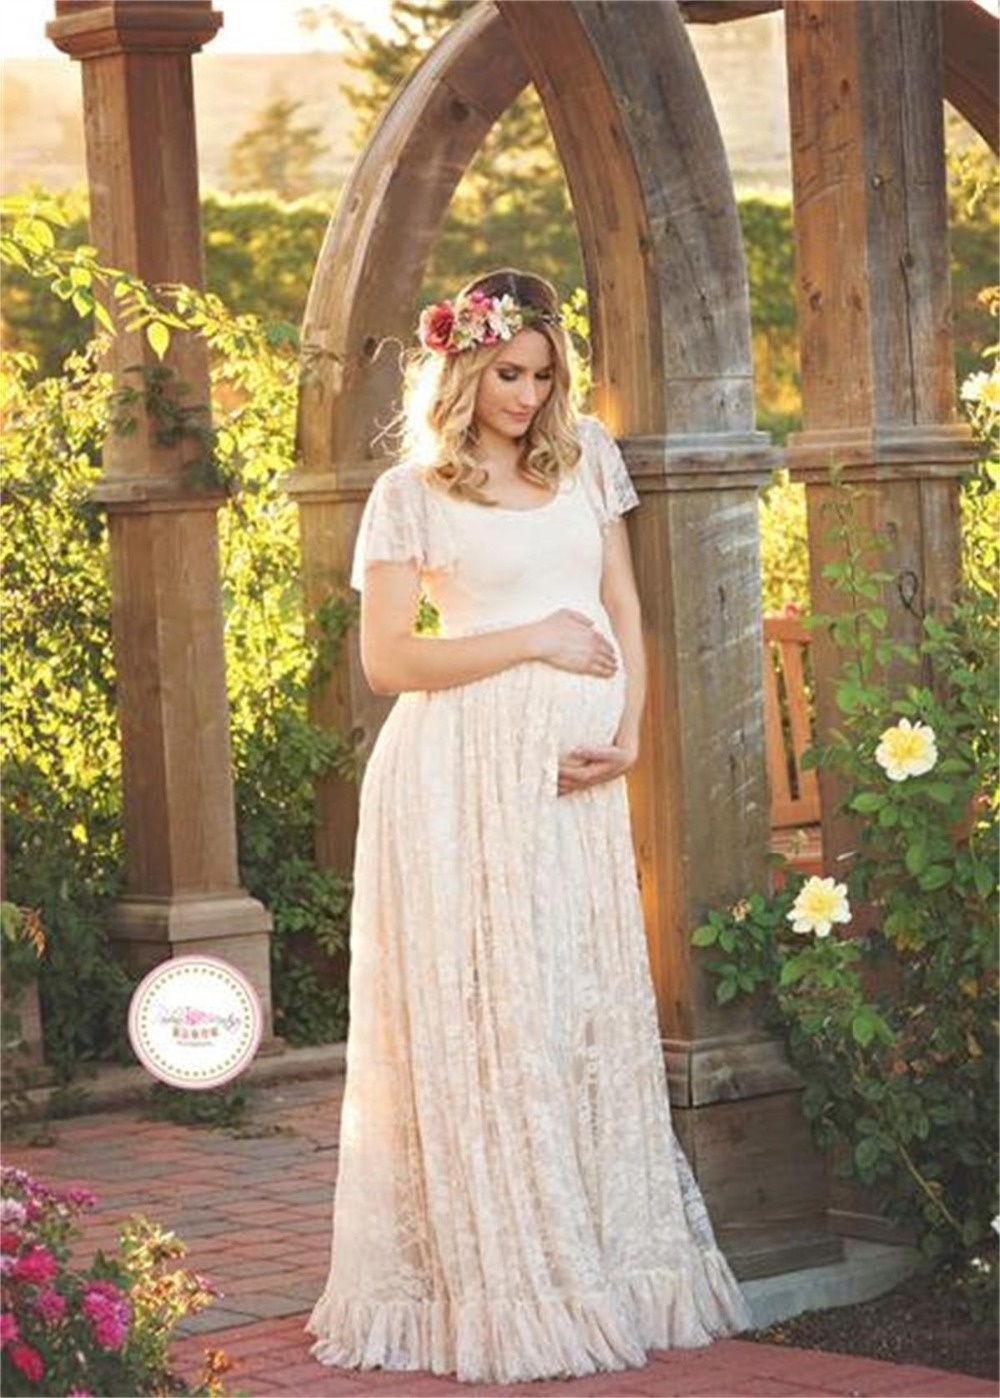 2017 жени бяла пола майчинство - Бременност и майчинство - Снимка 2